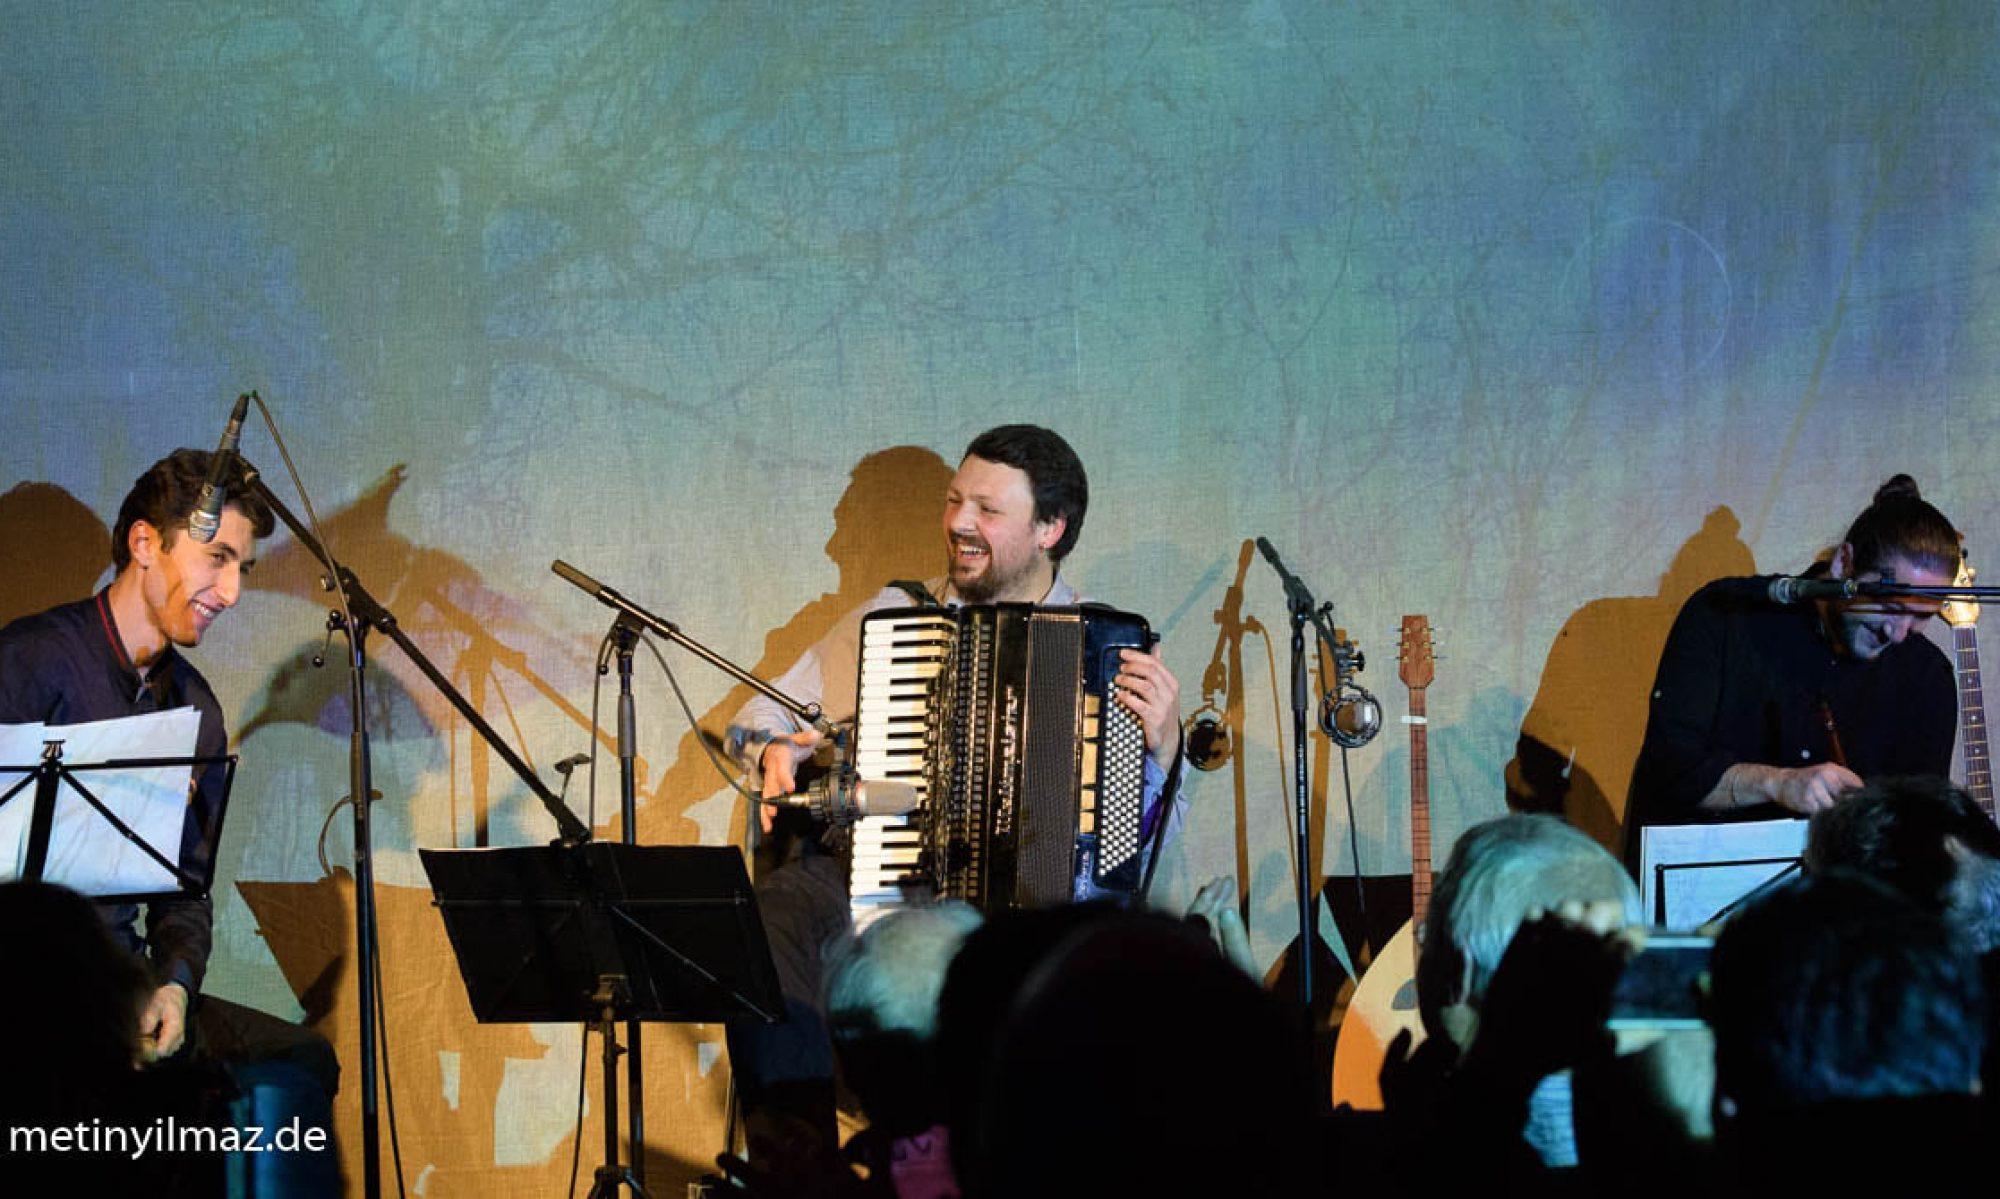 A.G.A Trio. Arsen Petrosyan, Mikail Yakut, Deniz Mahir Kartal